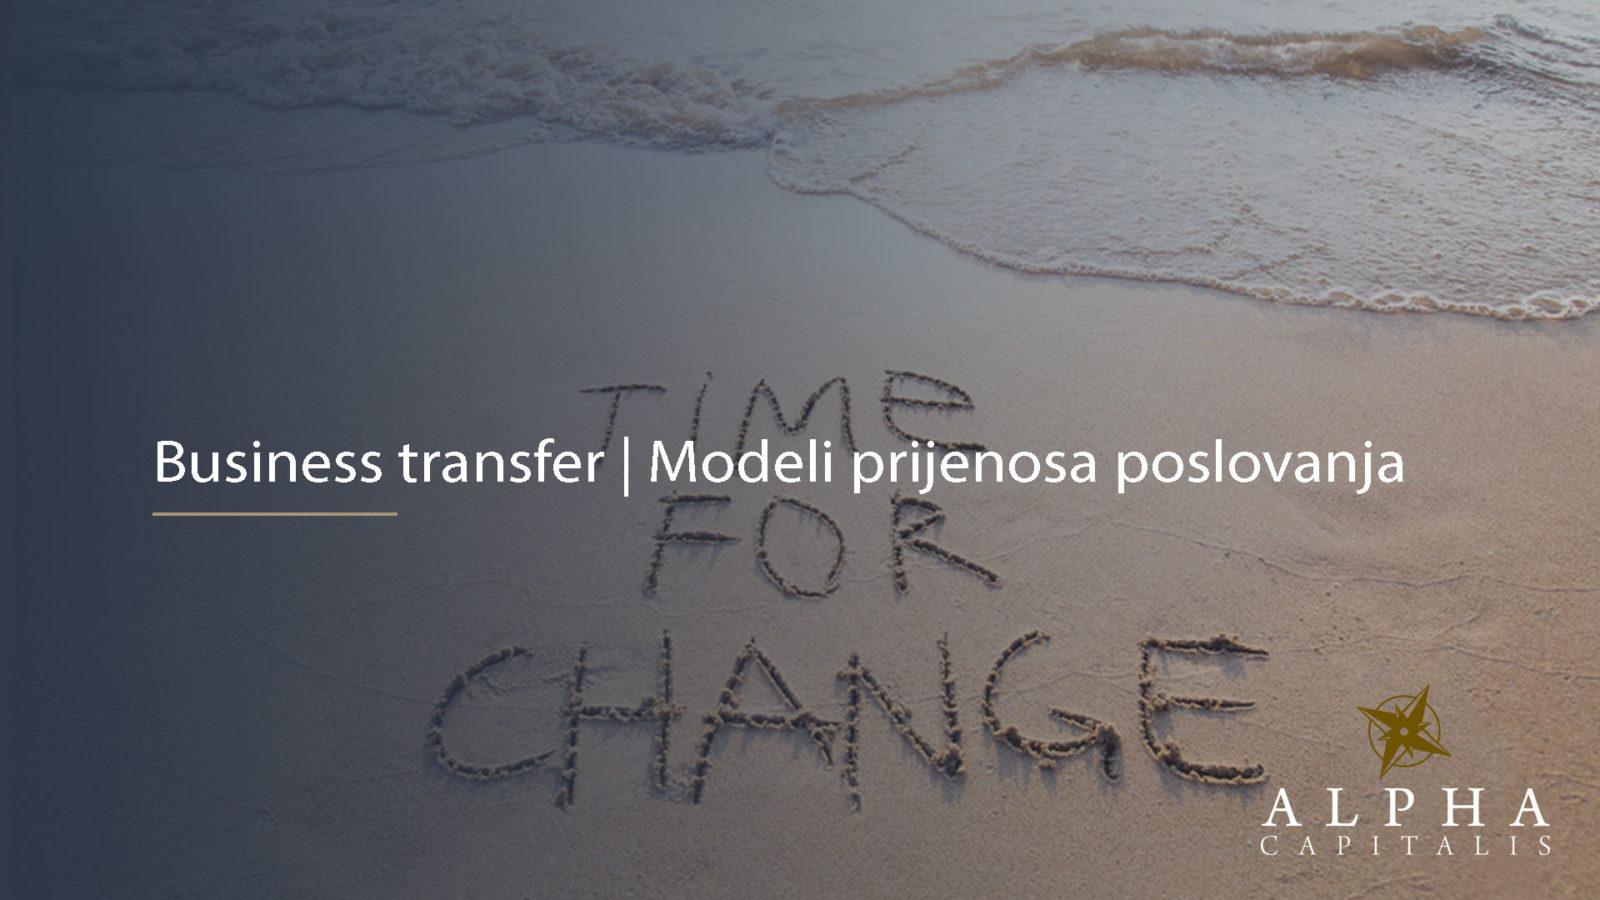 Business transfer 2019 11 07 - Modeli prijenosa poslovanja